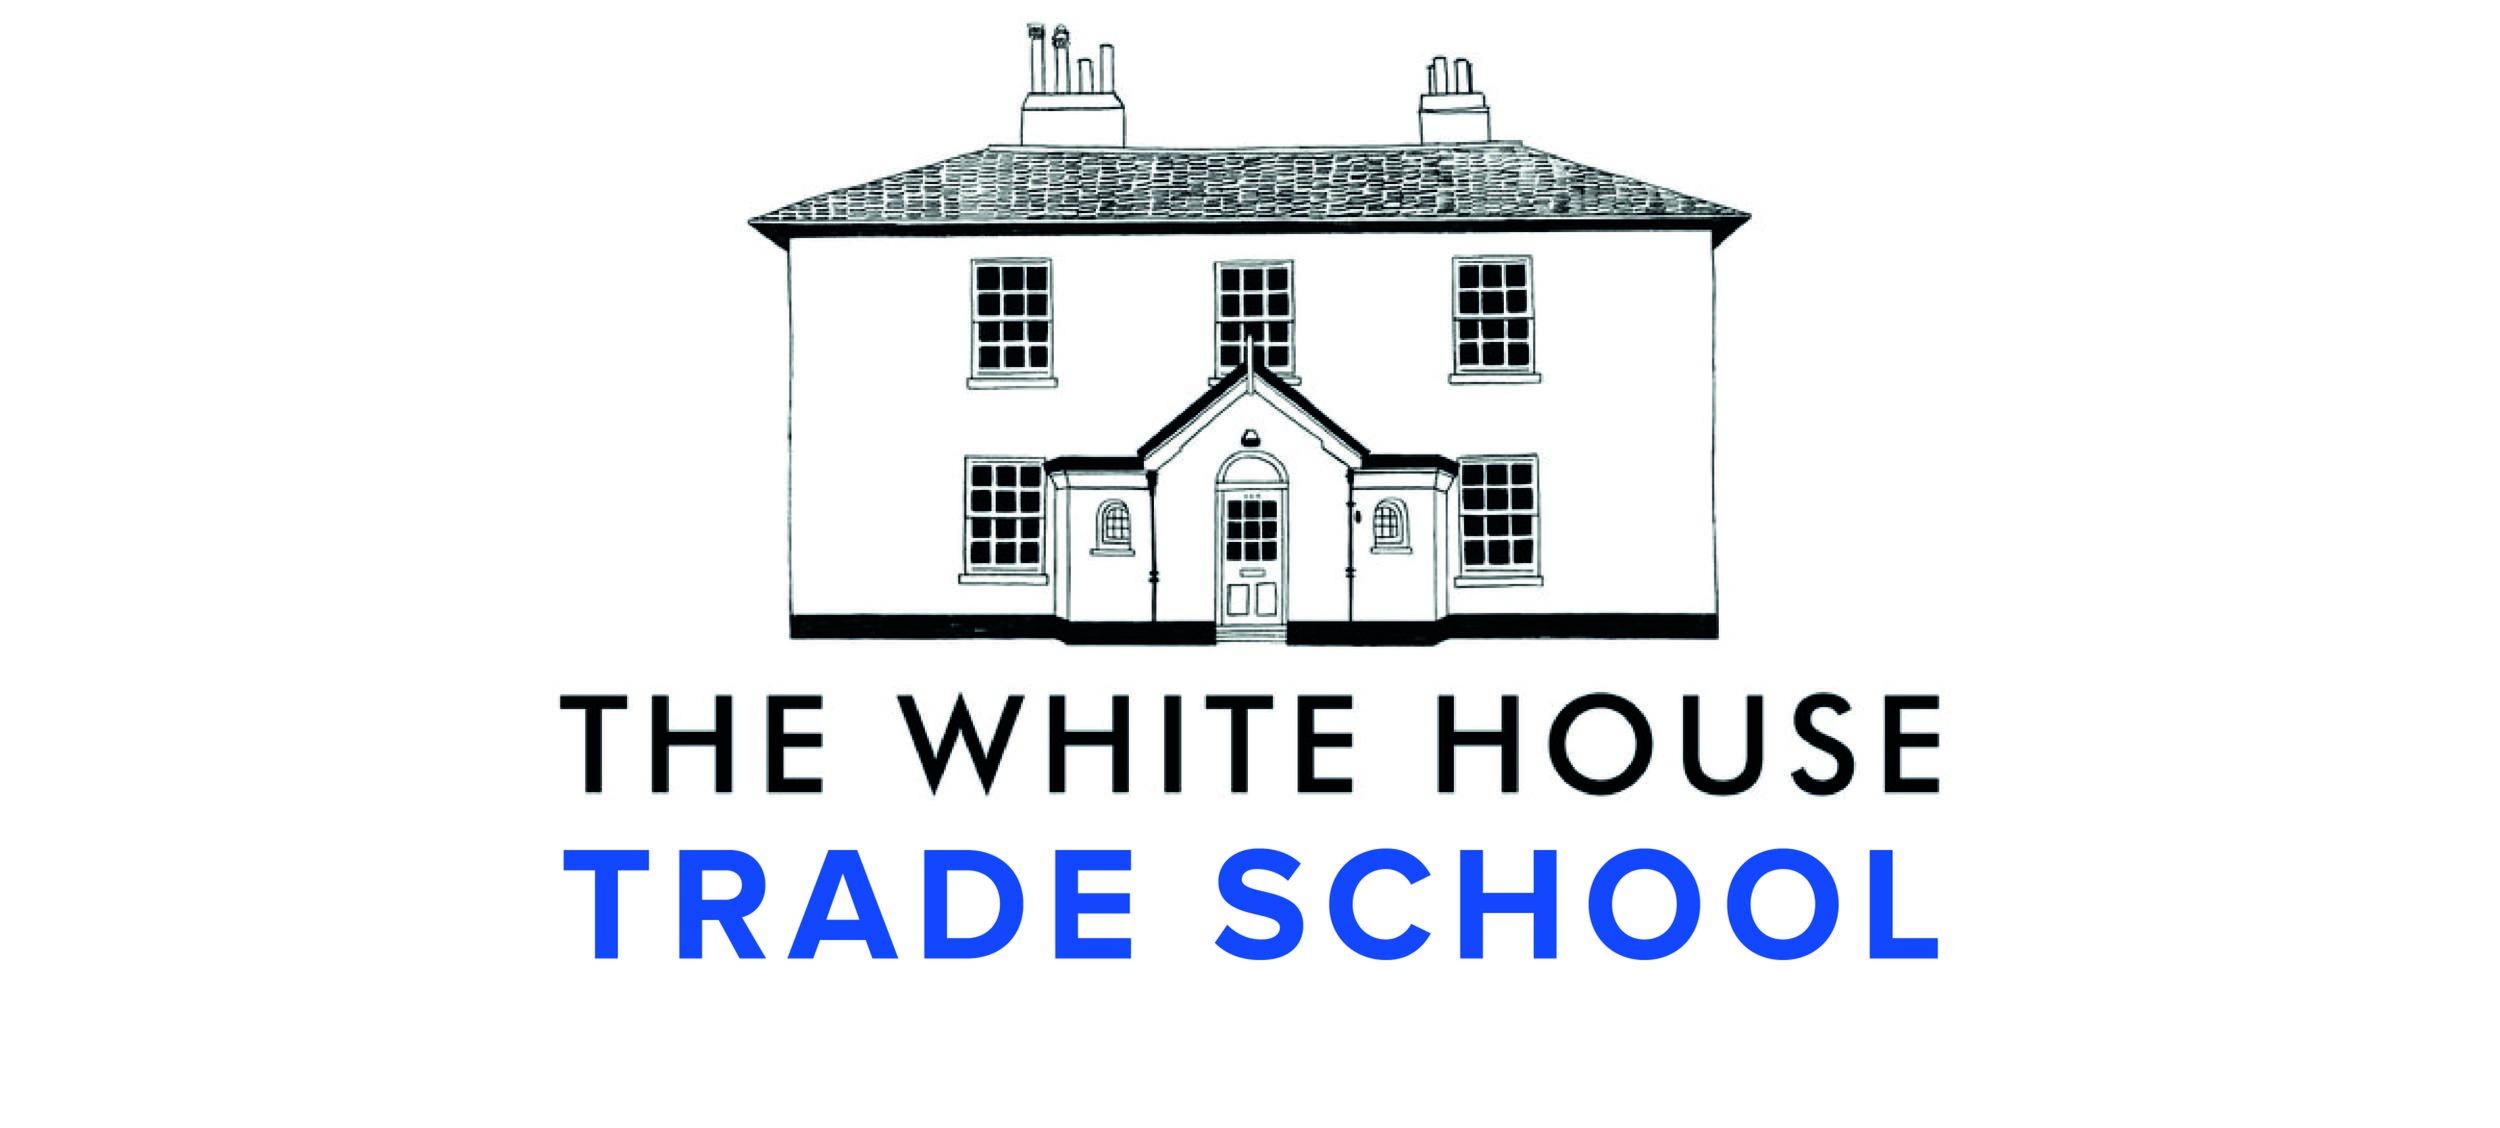 Whitehousetradeschool copy.jpg